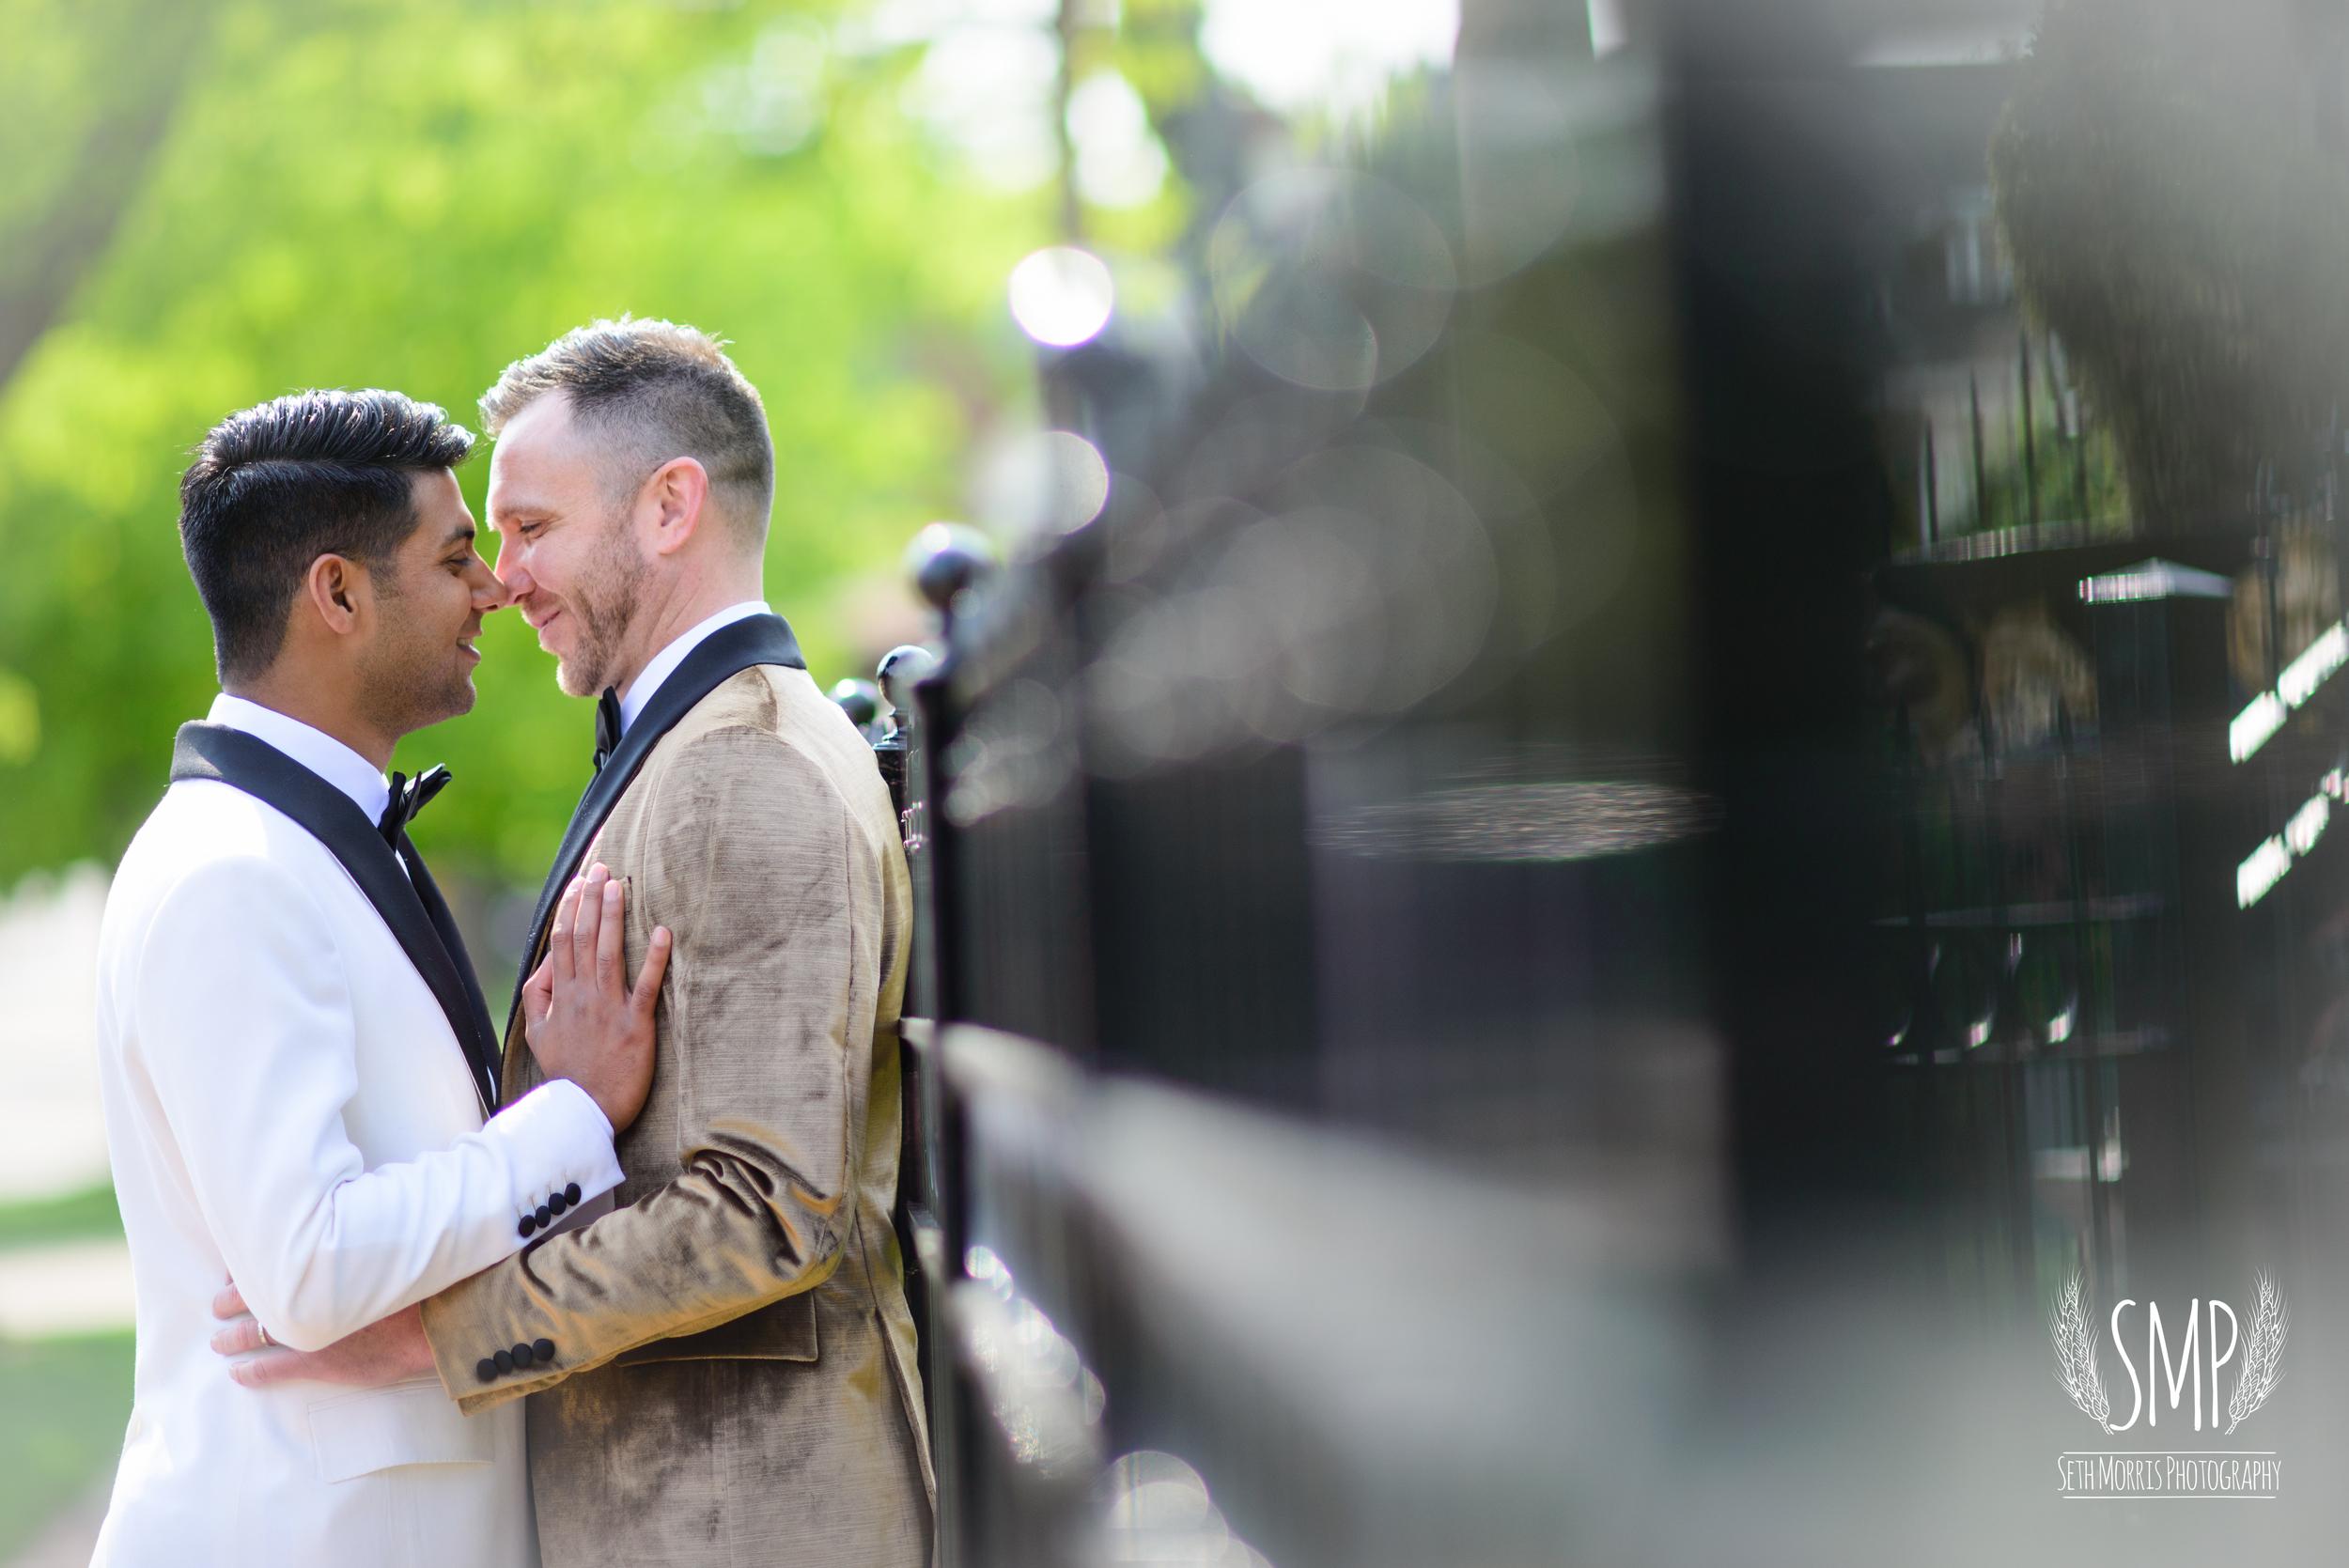 same-sex-wedding-photographer-chicago-illinois-38.jpg